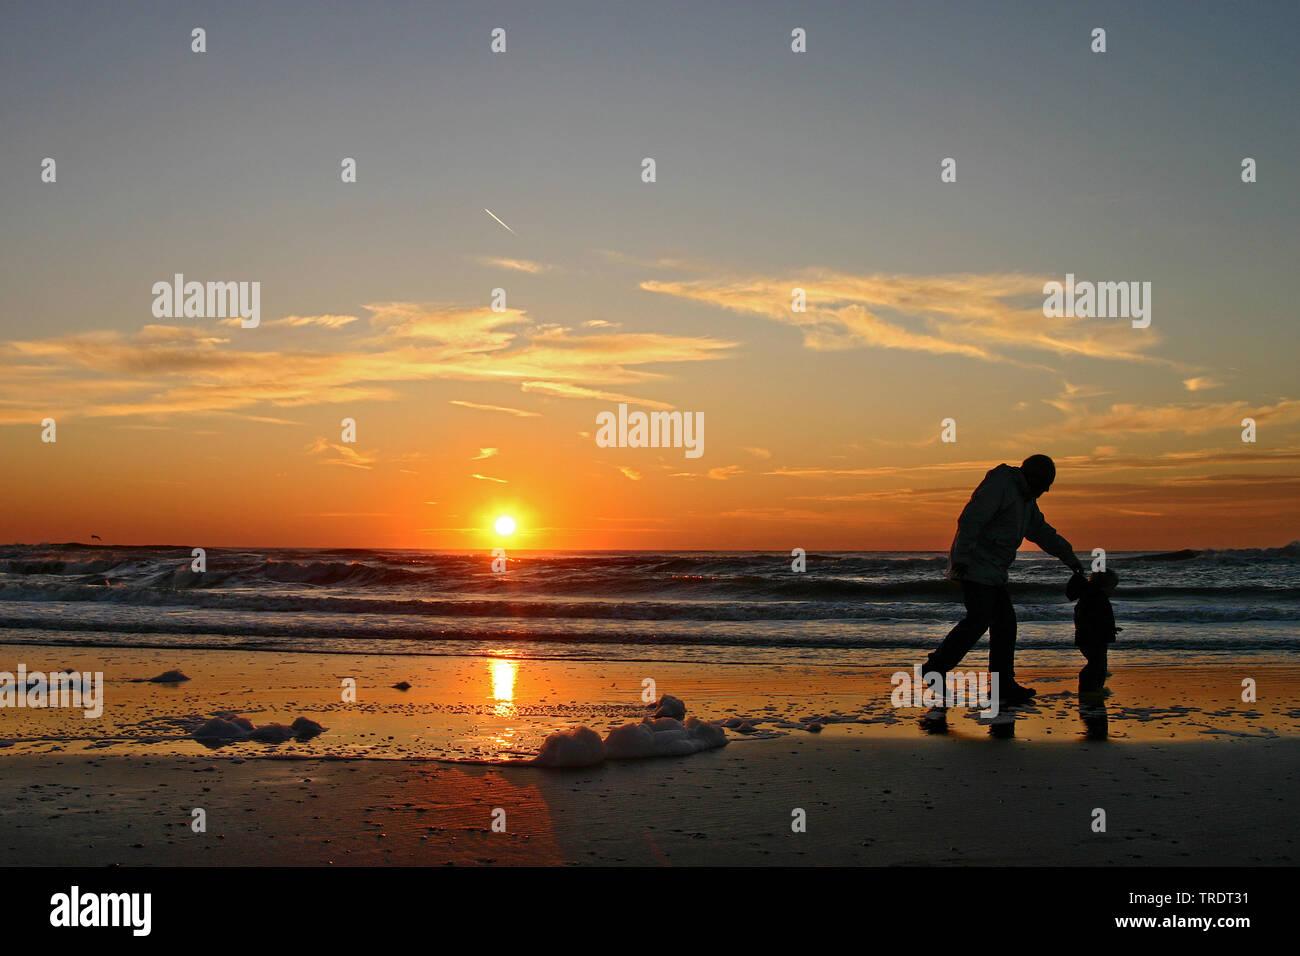 Mann mit kleinem Kind am Strand bei Sonnenuntergang, Niederlande   man with child on the beach at sunset, Netherlands   BLWS509855.jpg [ (c) blickwink - Stock Image